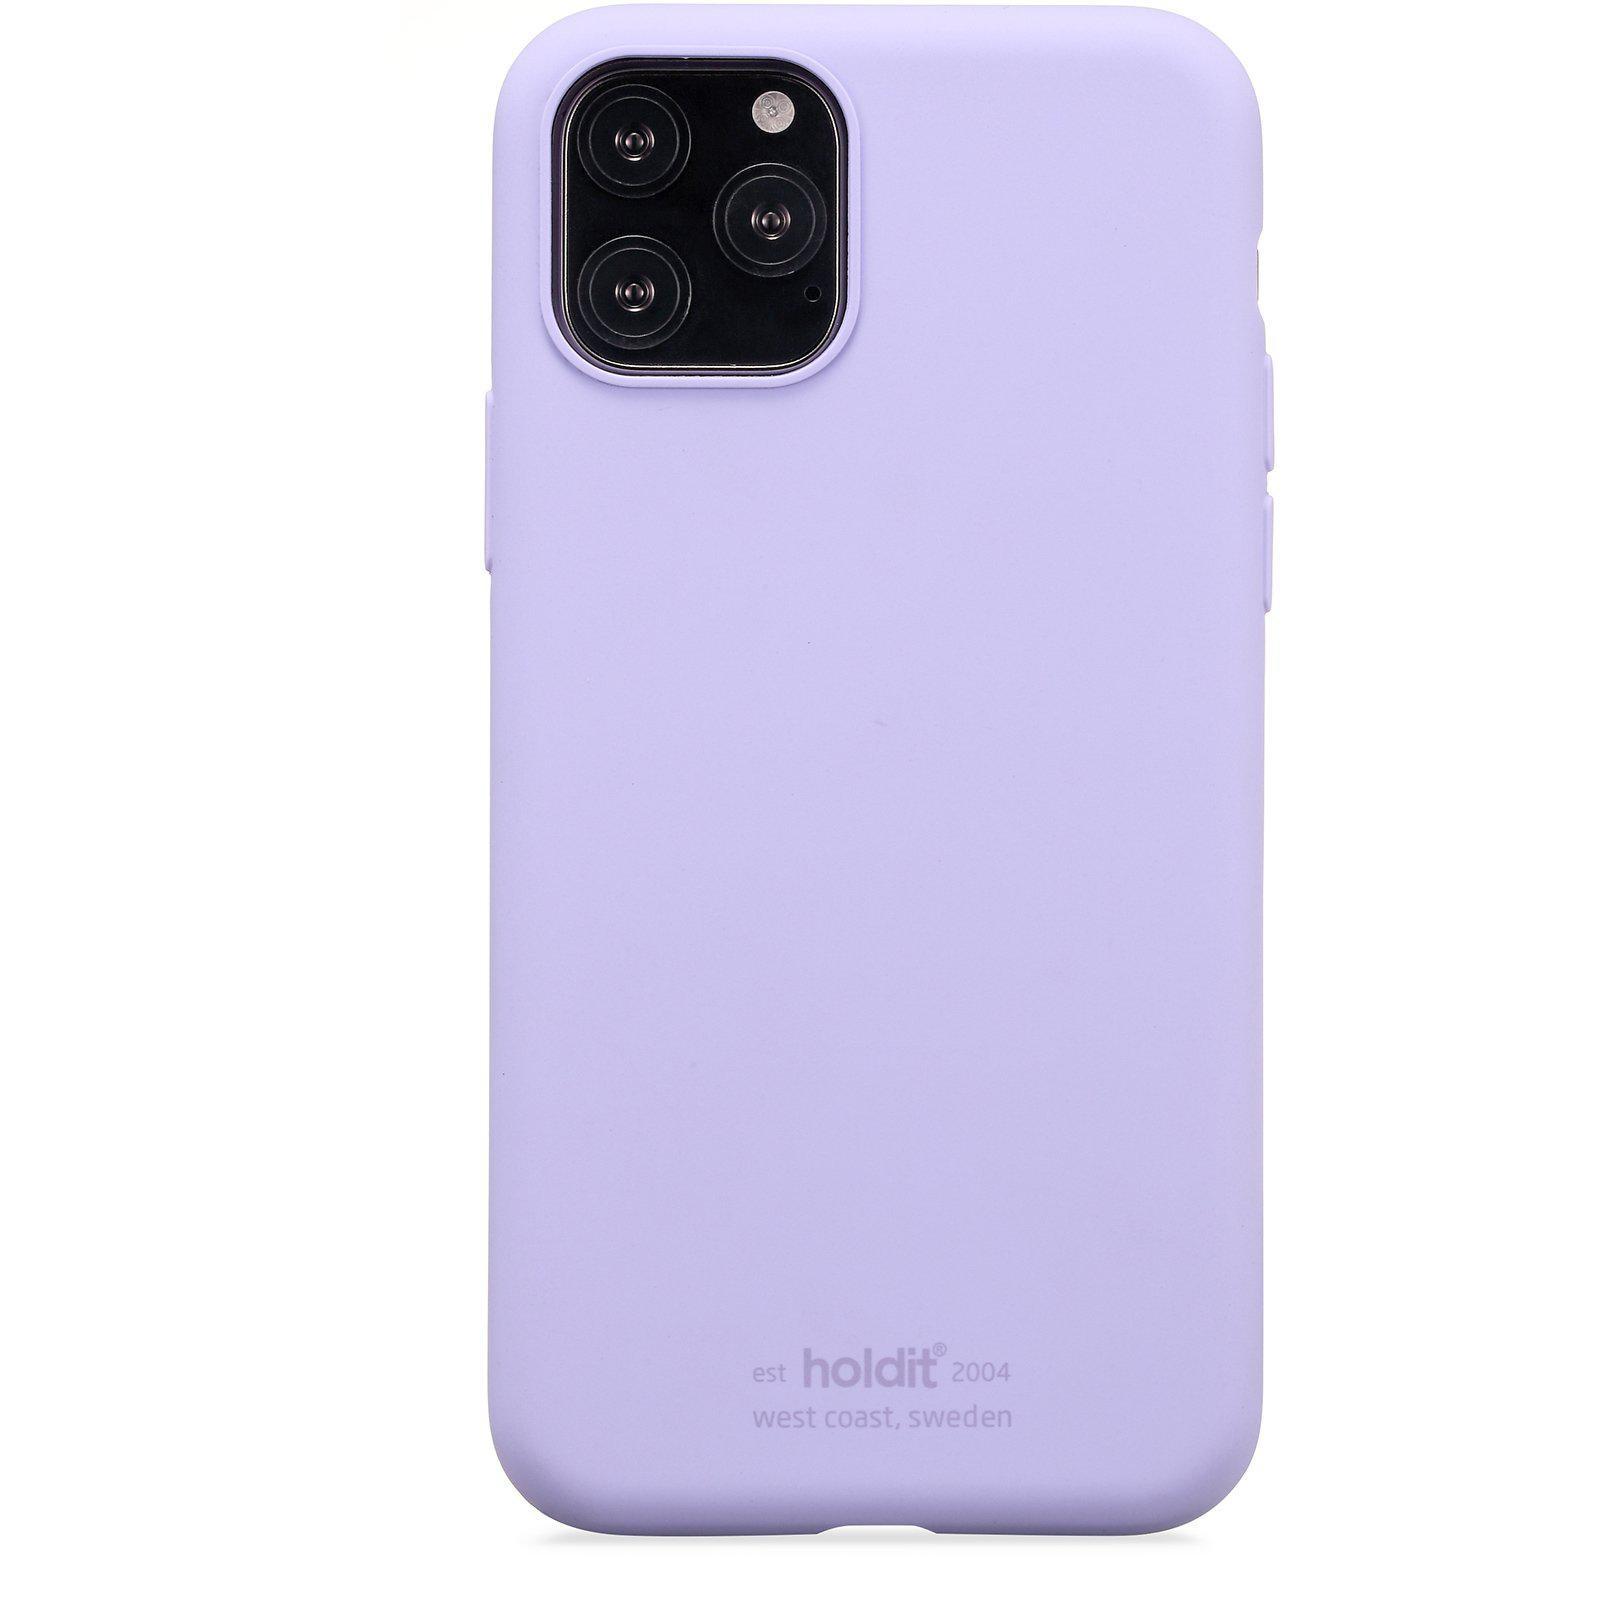 Silikonikuori iPhone 11 Pro/XS/X Lavender